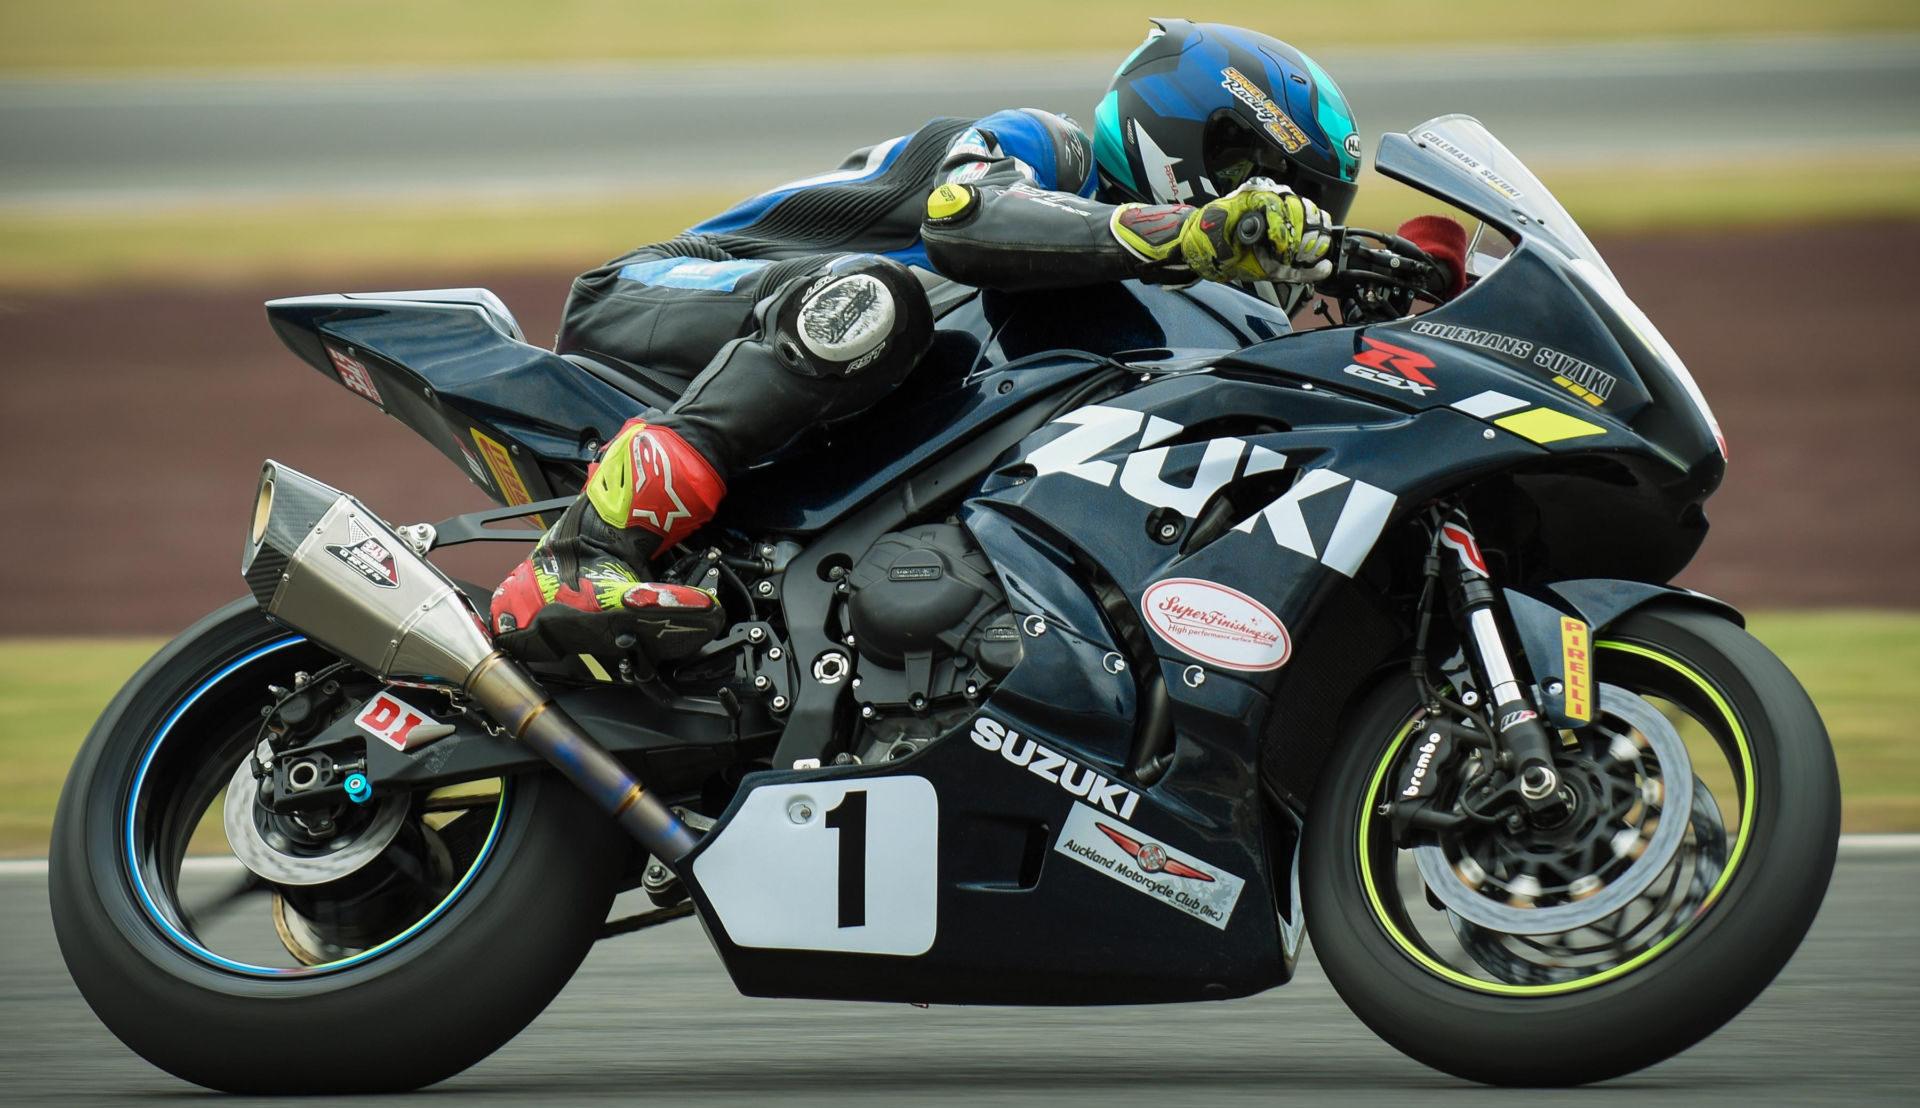 Defending New Zealand Superbike Champion Daniel Mettam (1). Photo by Andy McGechan, courtesy of Team Suzuki Press Office.